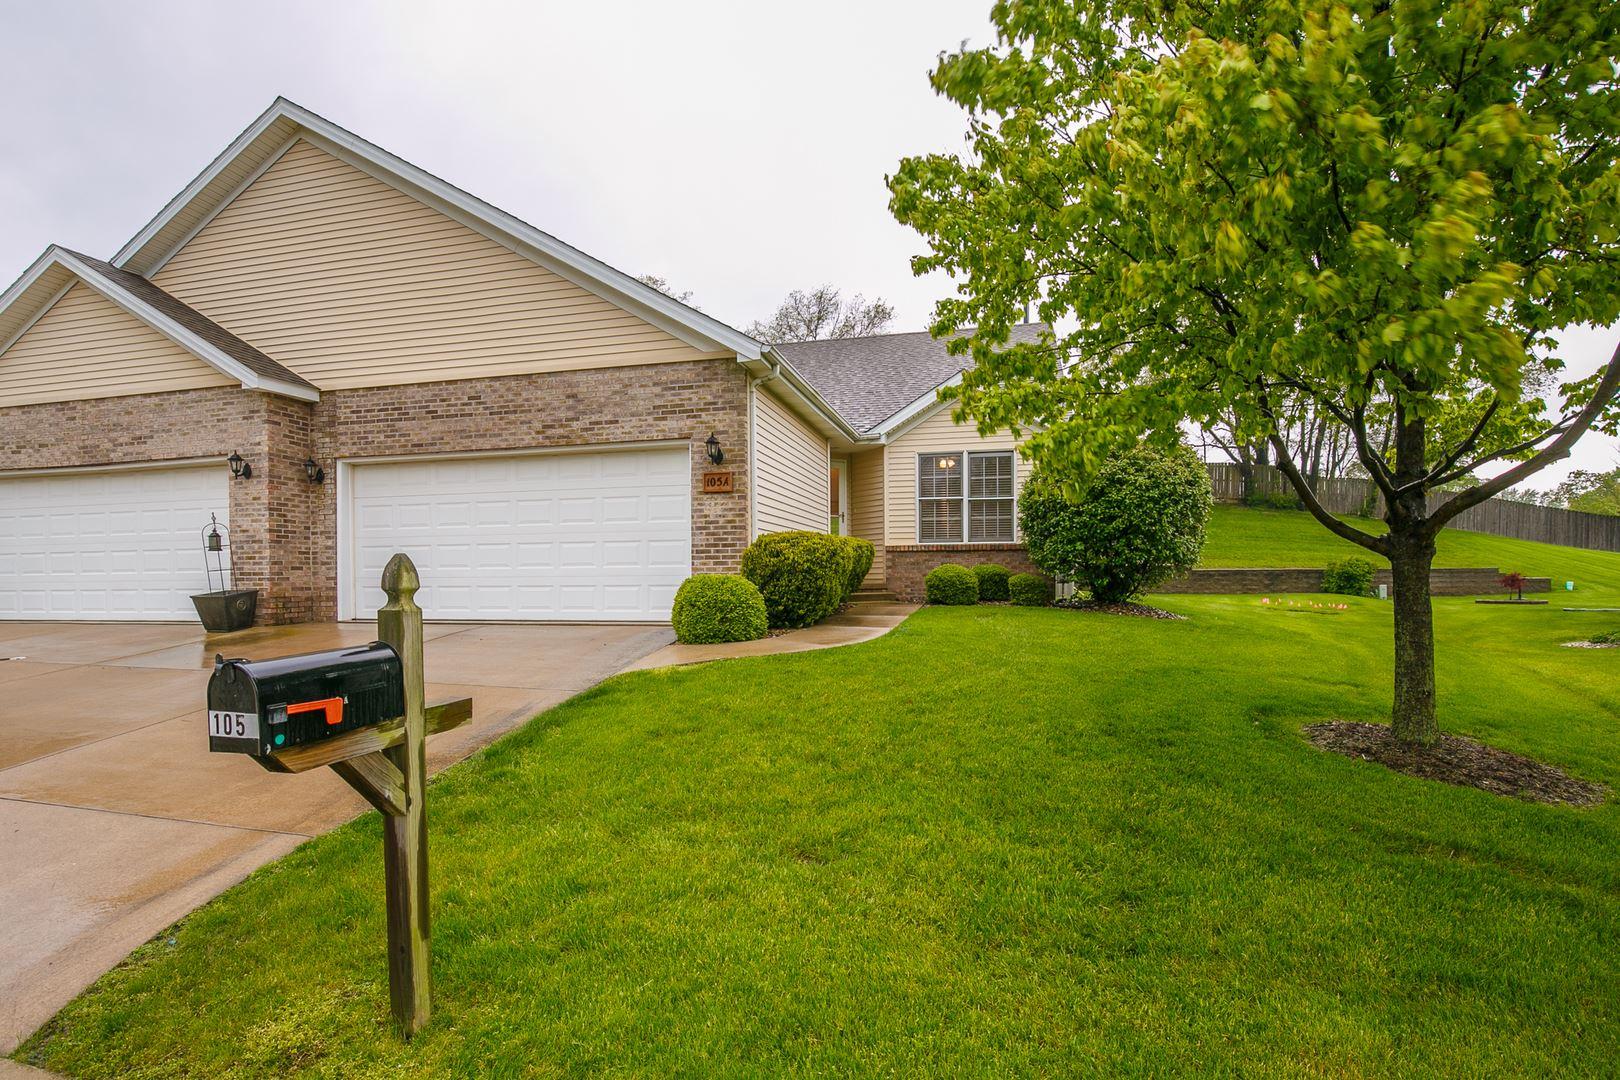 105 Meadow Ridge Drive #A, Bloomington, IL 61704 - #: 10725976